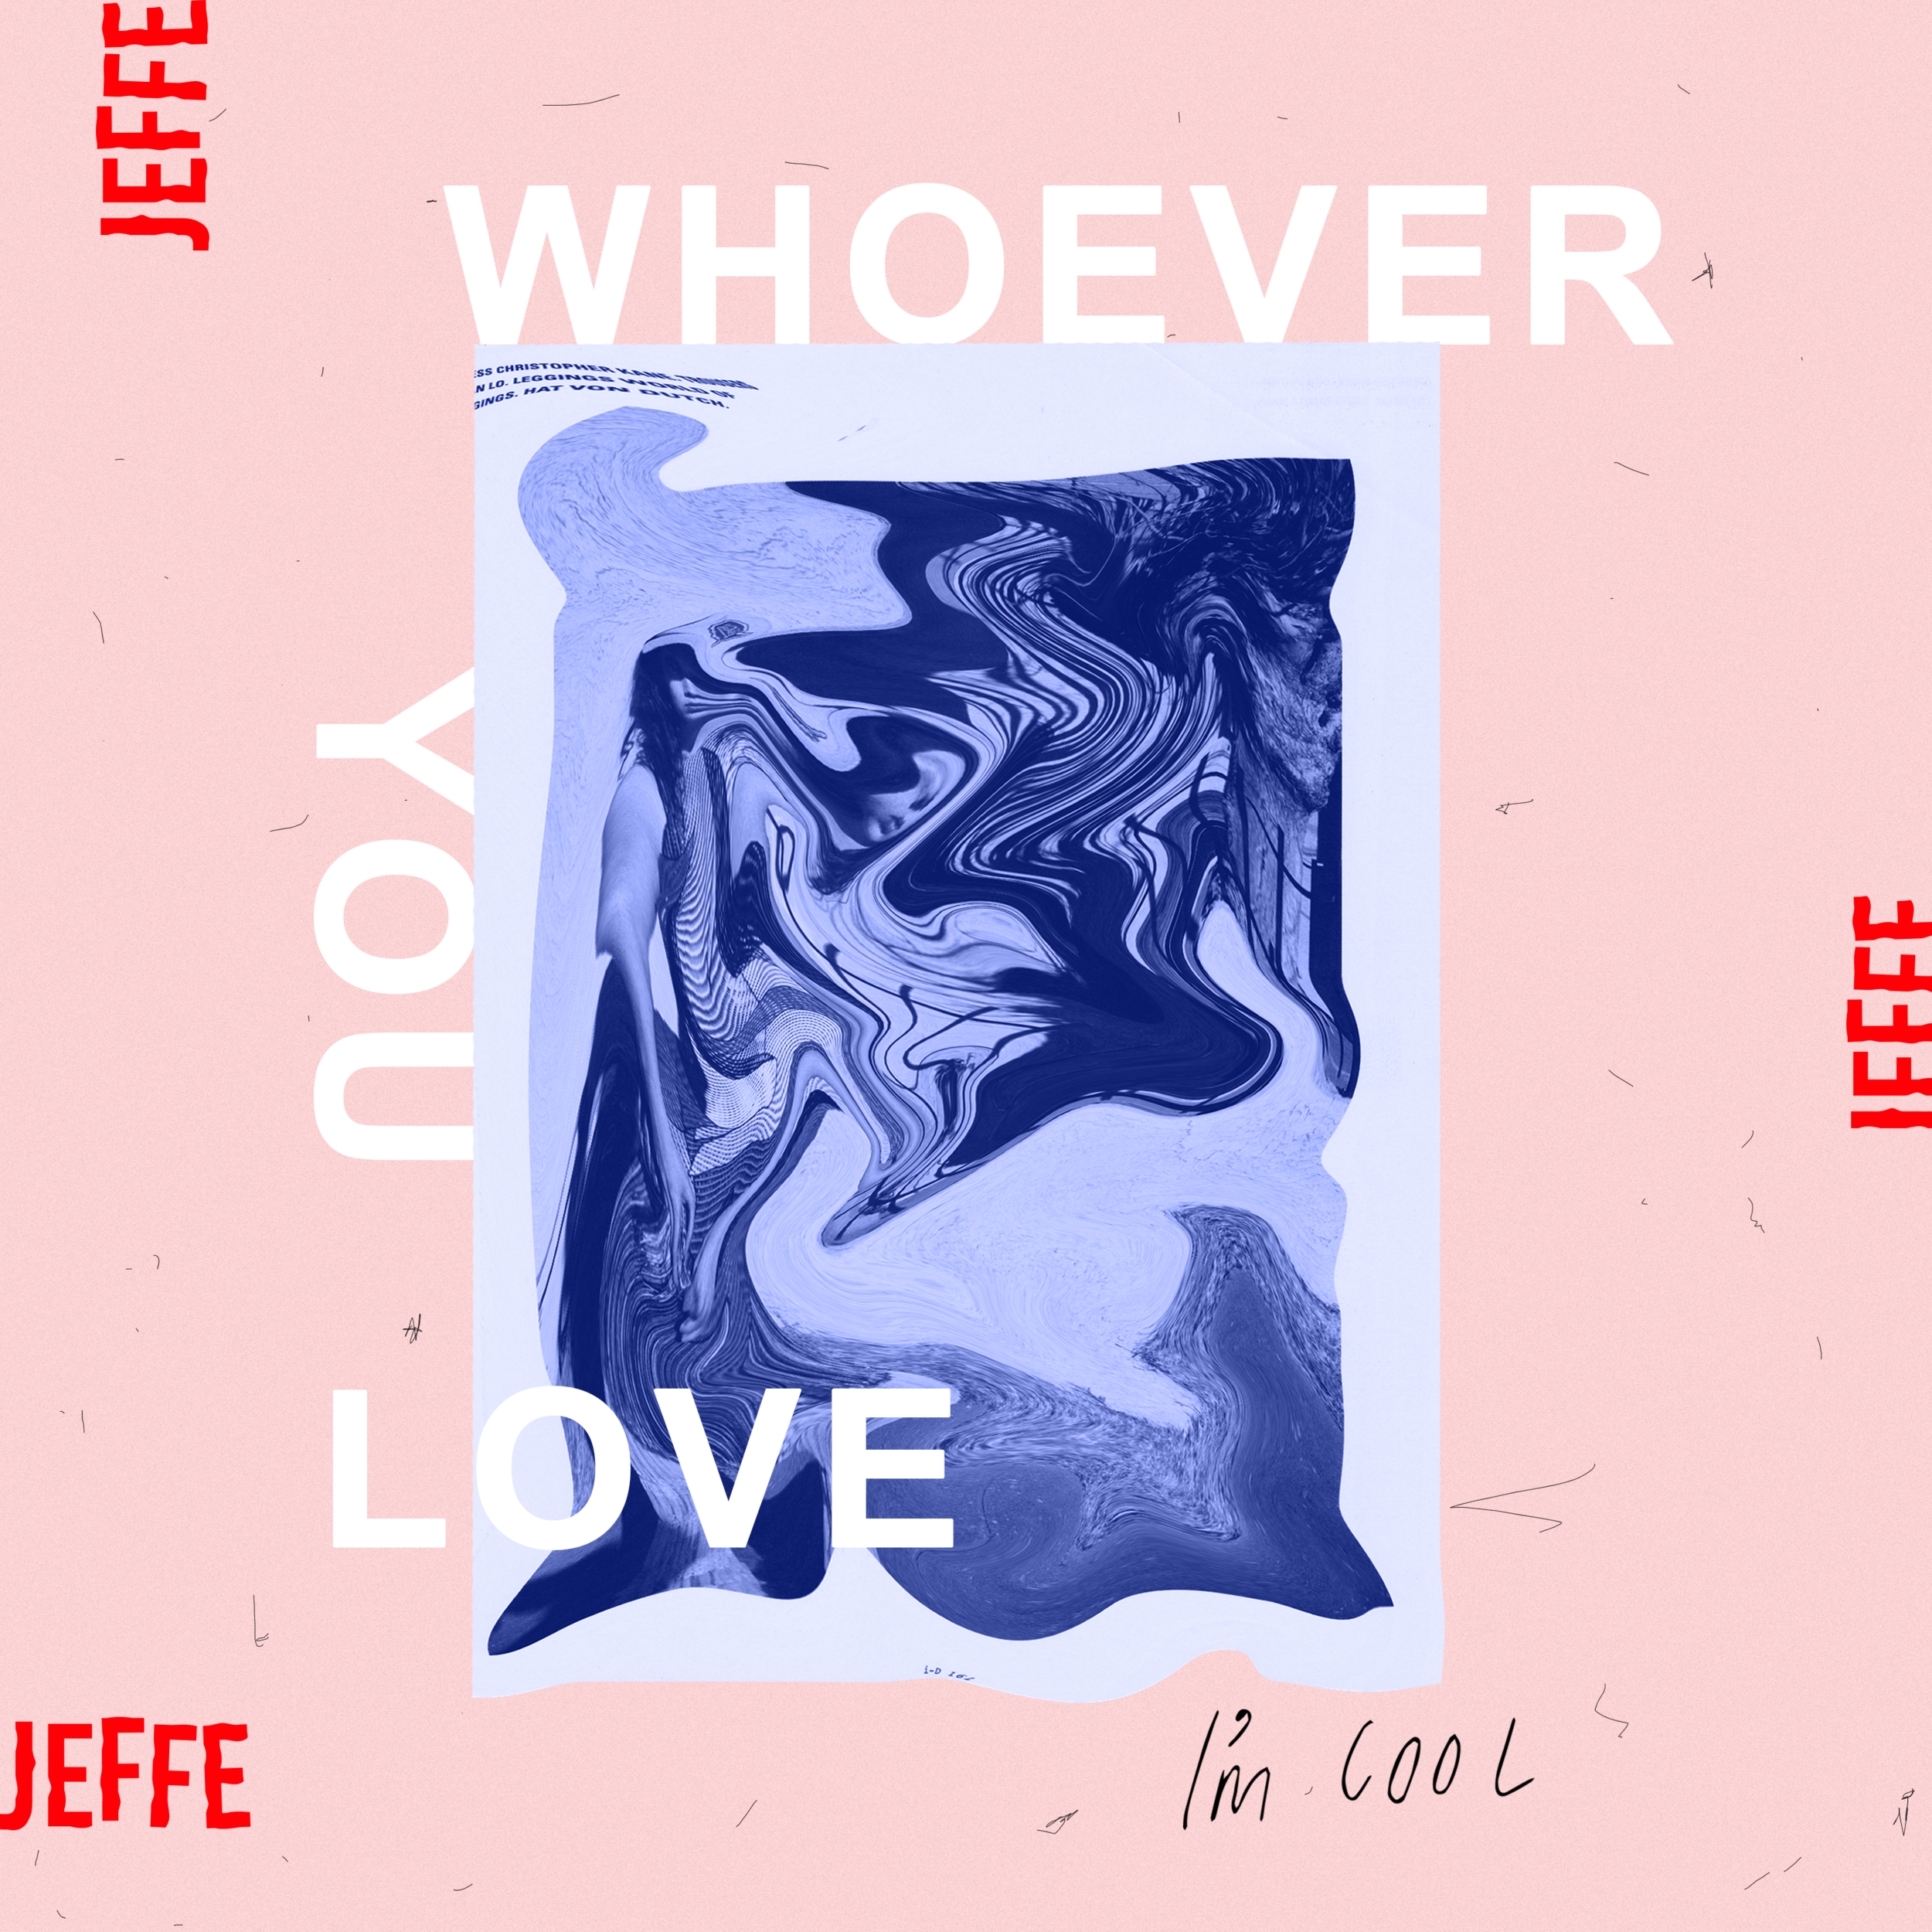 JEFFE_artwork_FINAL.png